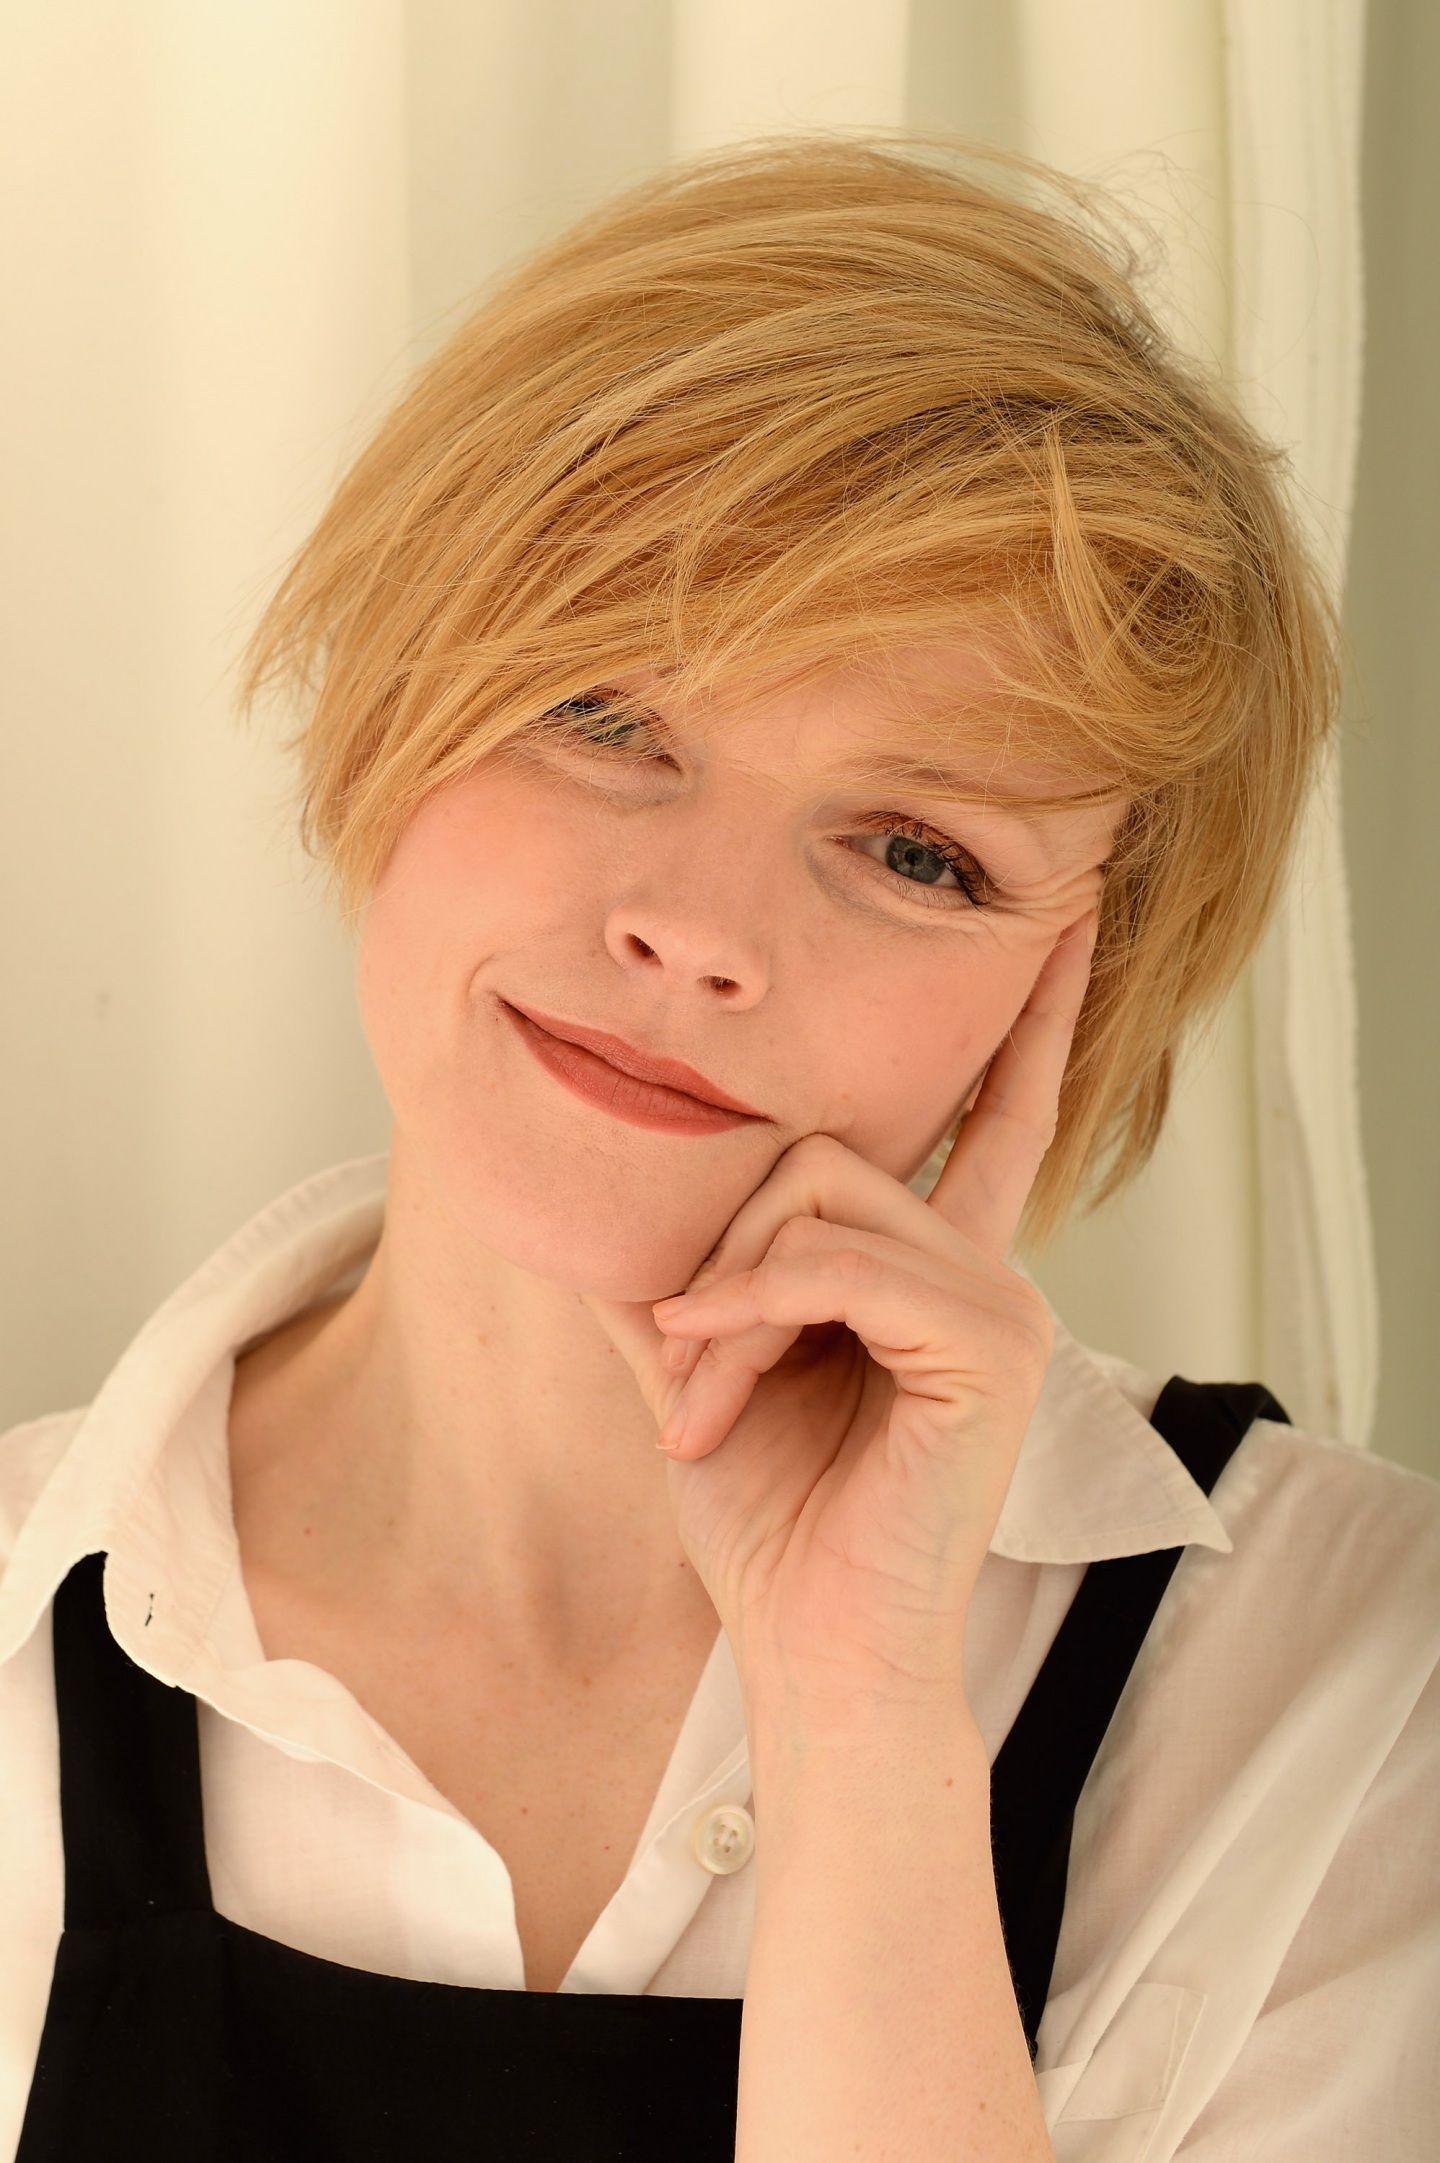 Maxine Peake. Biography, news, photos and videos